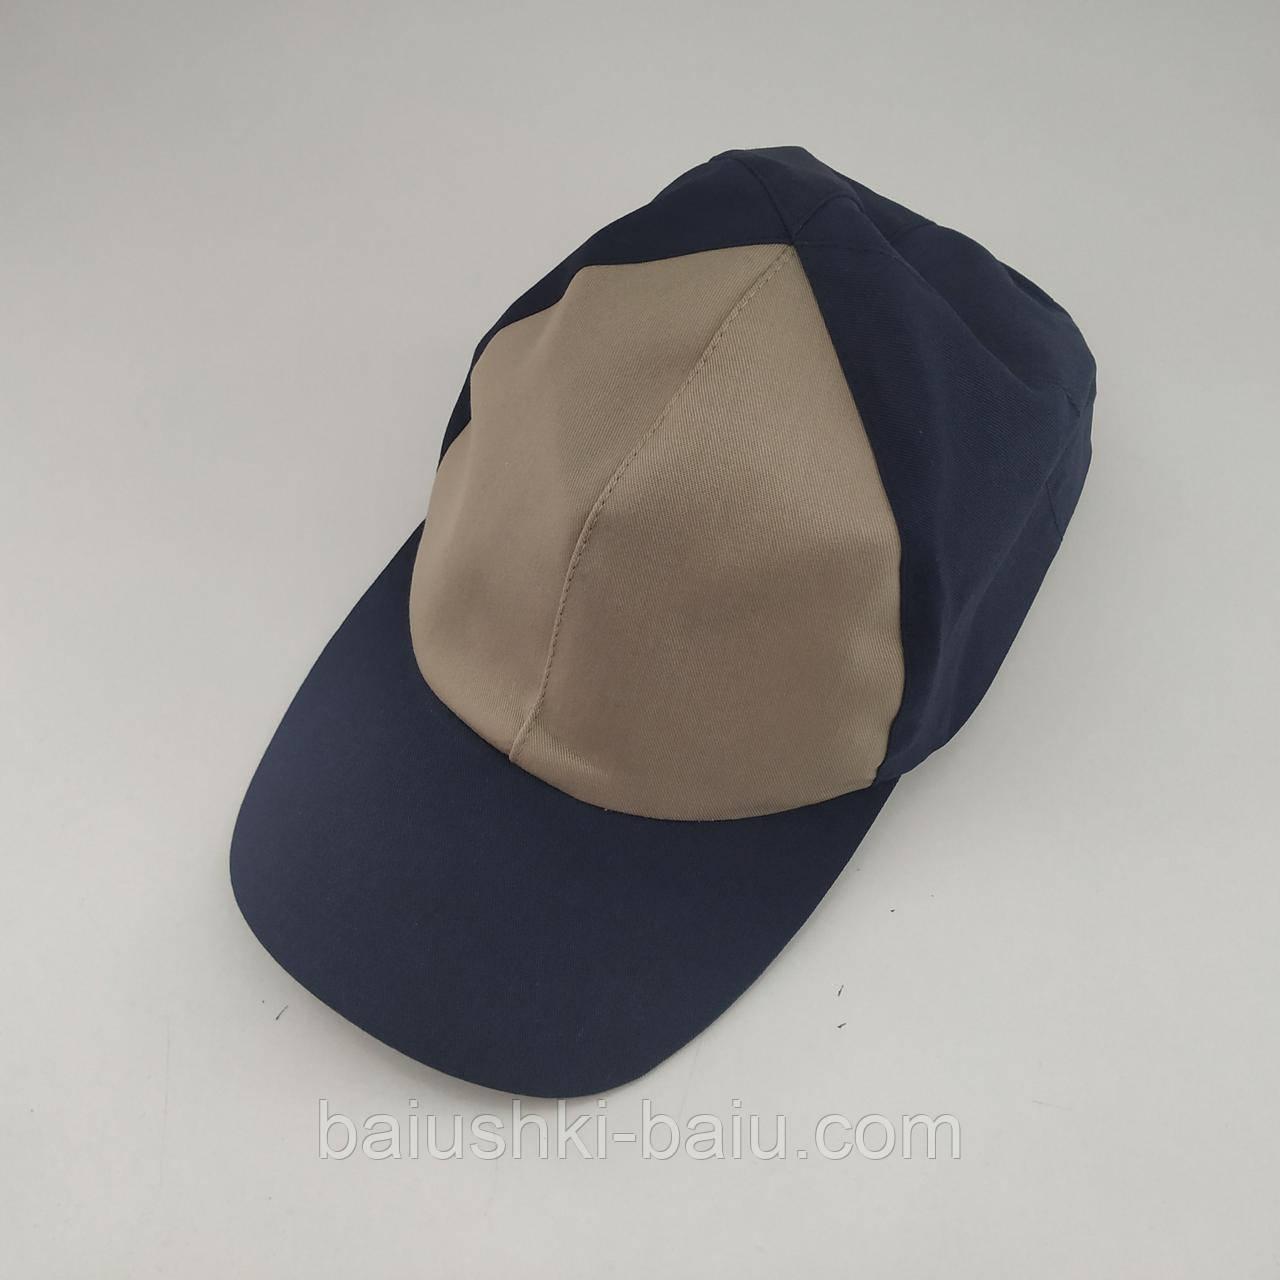 Дитяча кепка для хлопчика, р. 52-54 ТМ Babasik